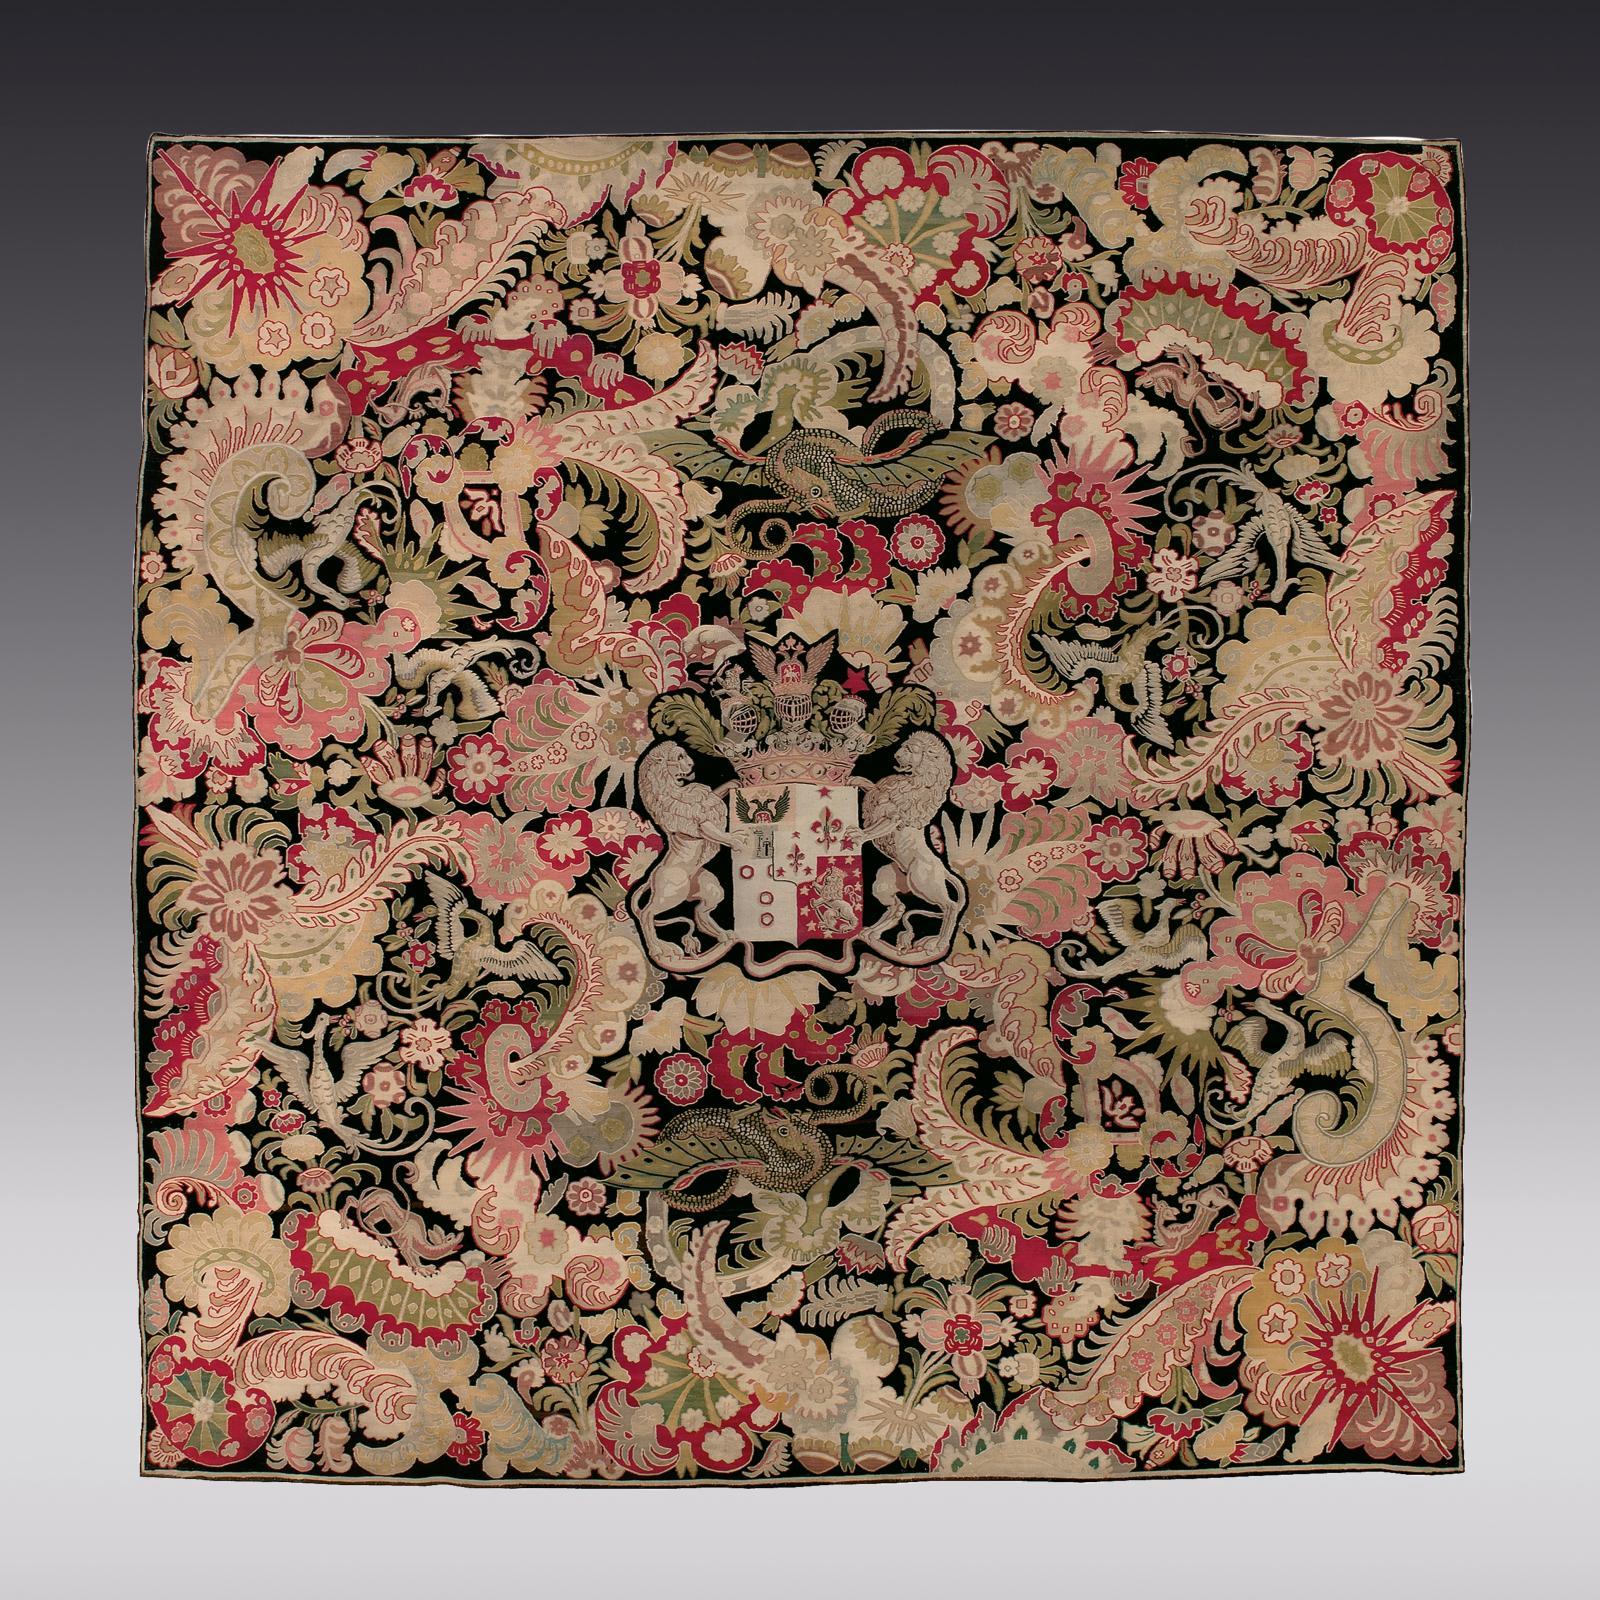 €75,000 Tapestry from a Russian Imperial workshop featuring the arms of General Pyotr Van Suchtelen (Count Jan Pieter Van Suchtelen, 1751-1836), probably for the Mihailovsky Palace, c. 1825, 314 x 310 cm (123.63 x 122.05 in). Paris, Drouot, April 5, 2011. Gros & Delettrez auction house.